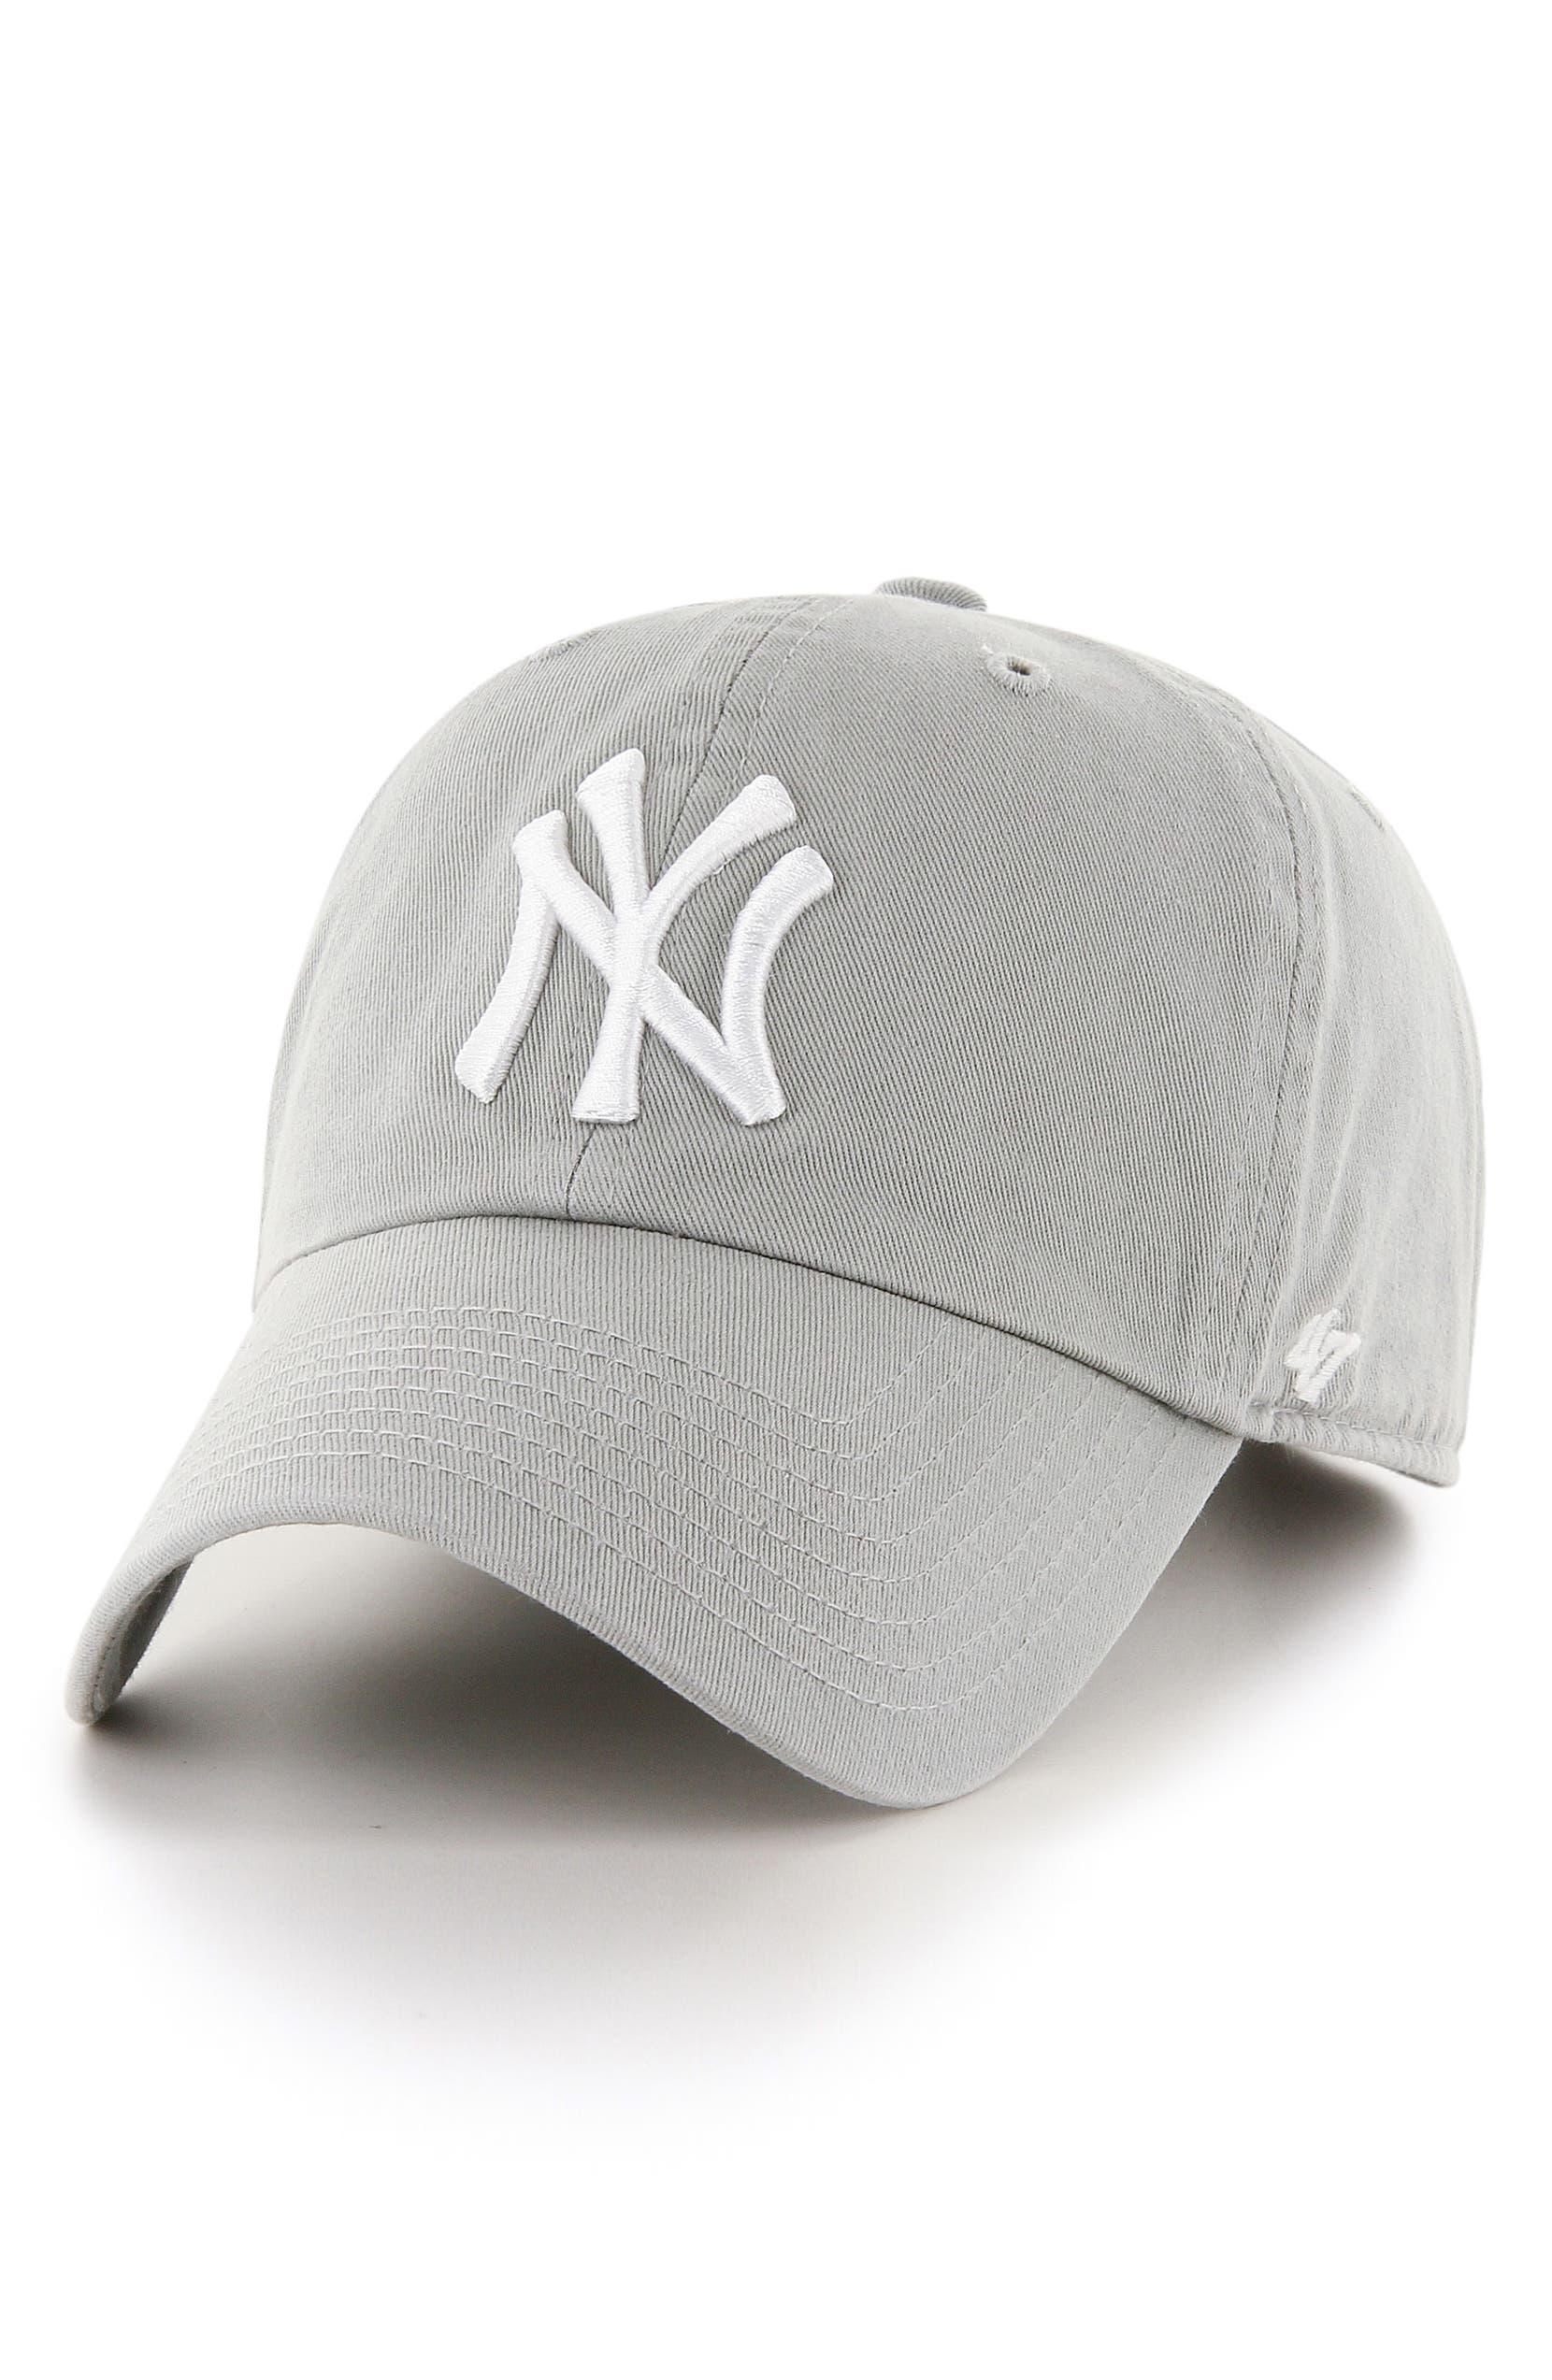 ef33d637 Clean Up NY Yankees Baseball Cap